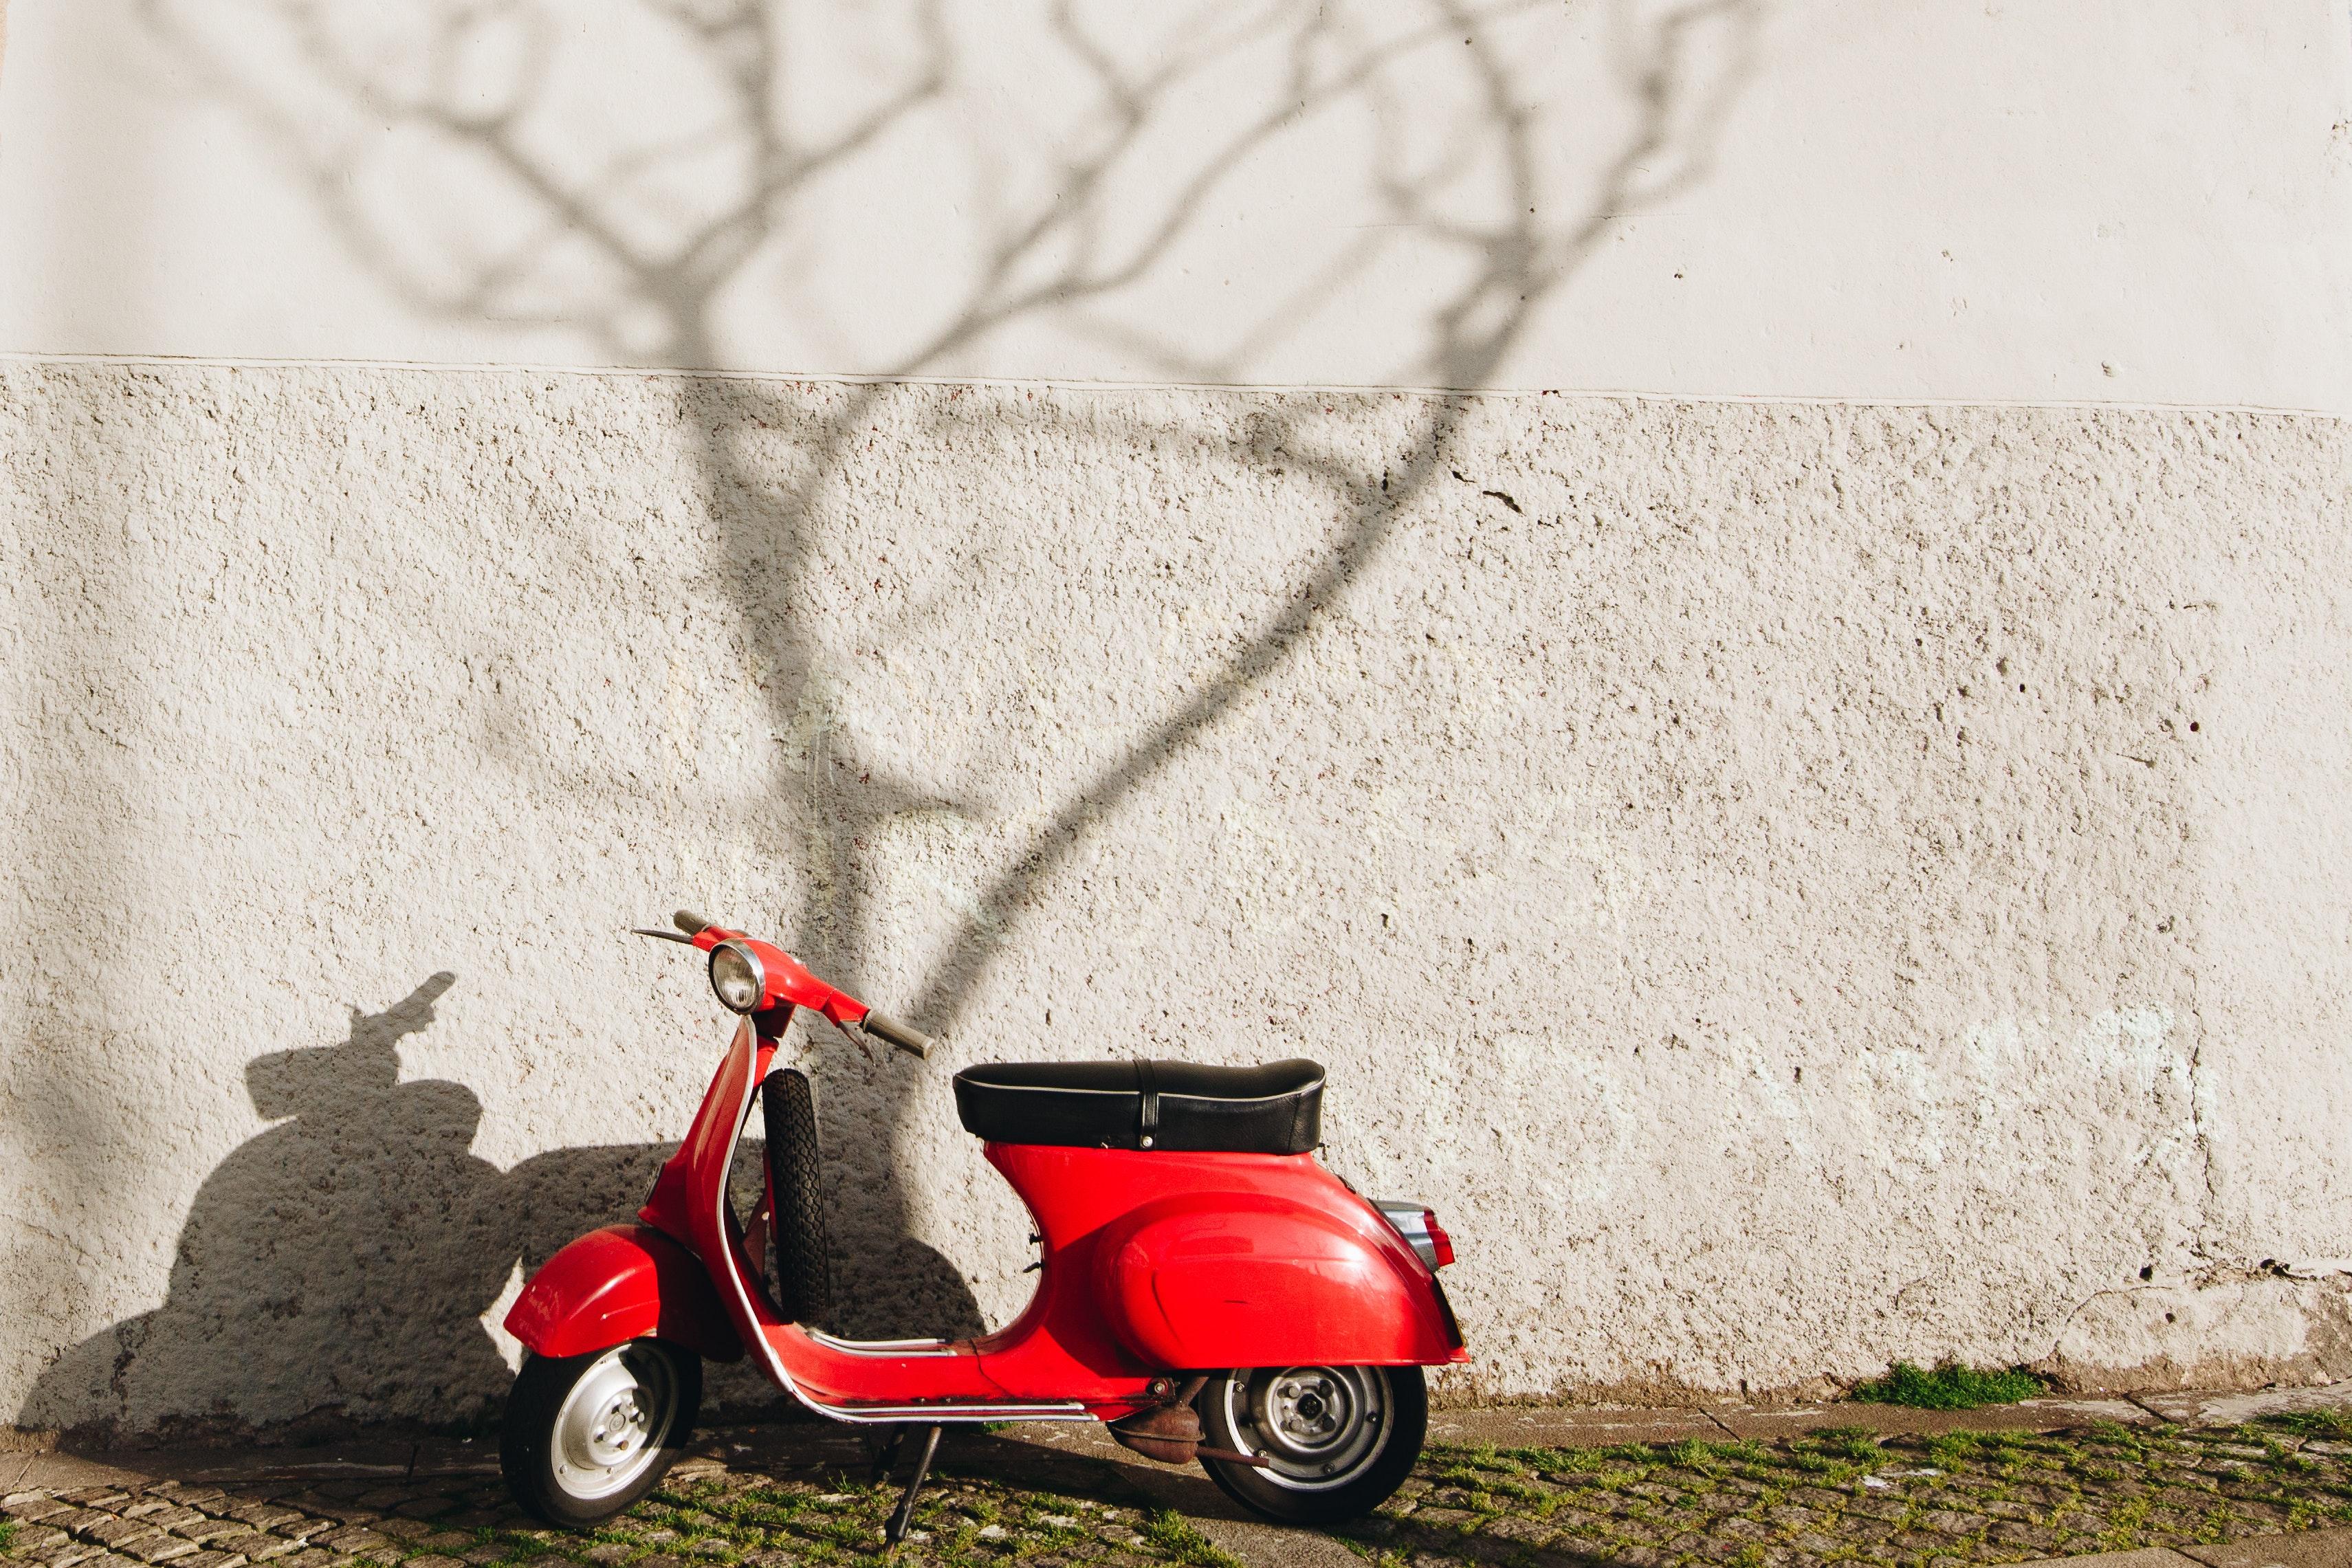 Free Images Bike Broken City Center City Life Color